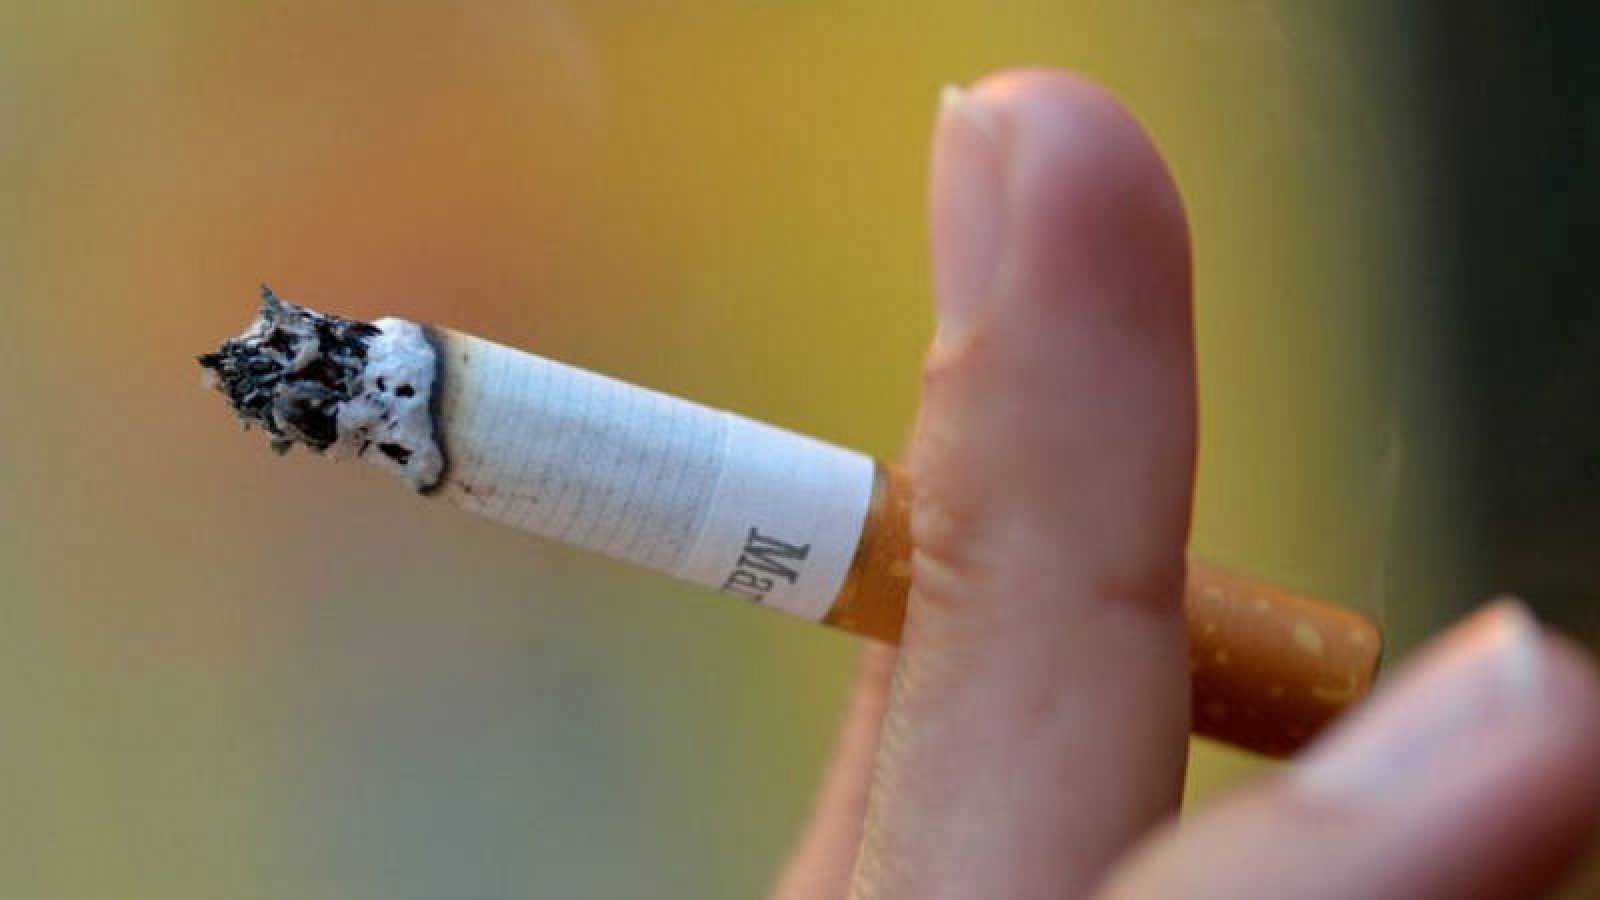 Una mujer fumando un cigarrillo